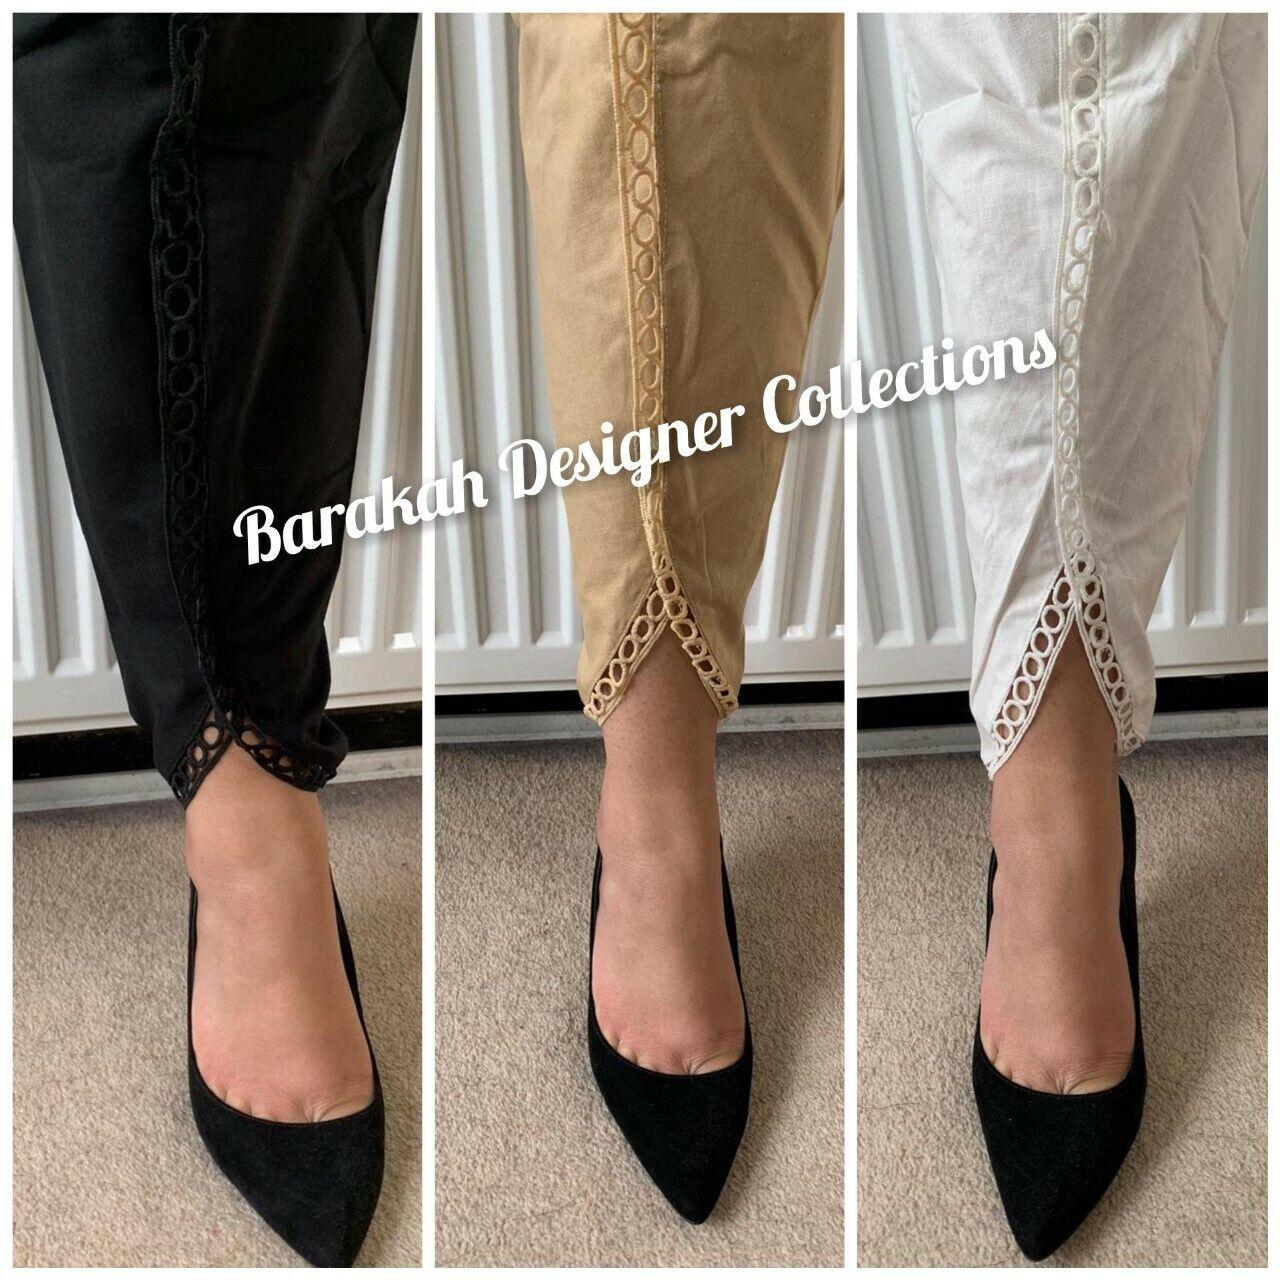 NEW LADIES PAKISTANI COTTON FANCY TULIP SHALWAR TROUSERS PANTS BLACK WHITE S M L